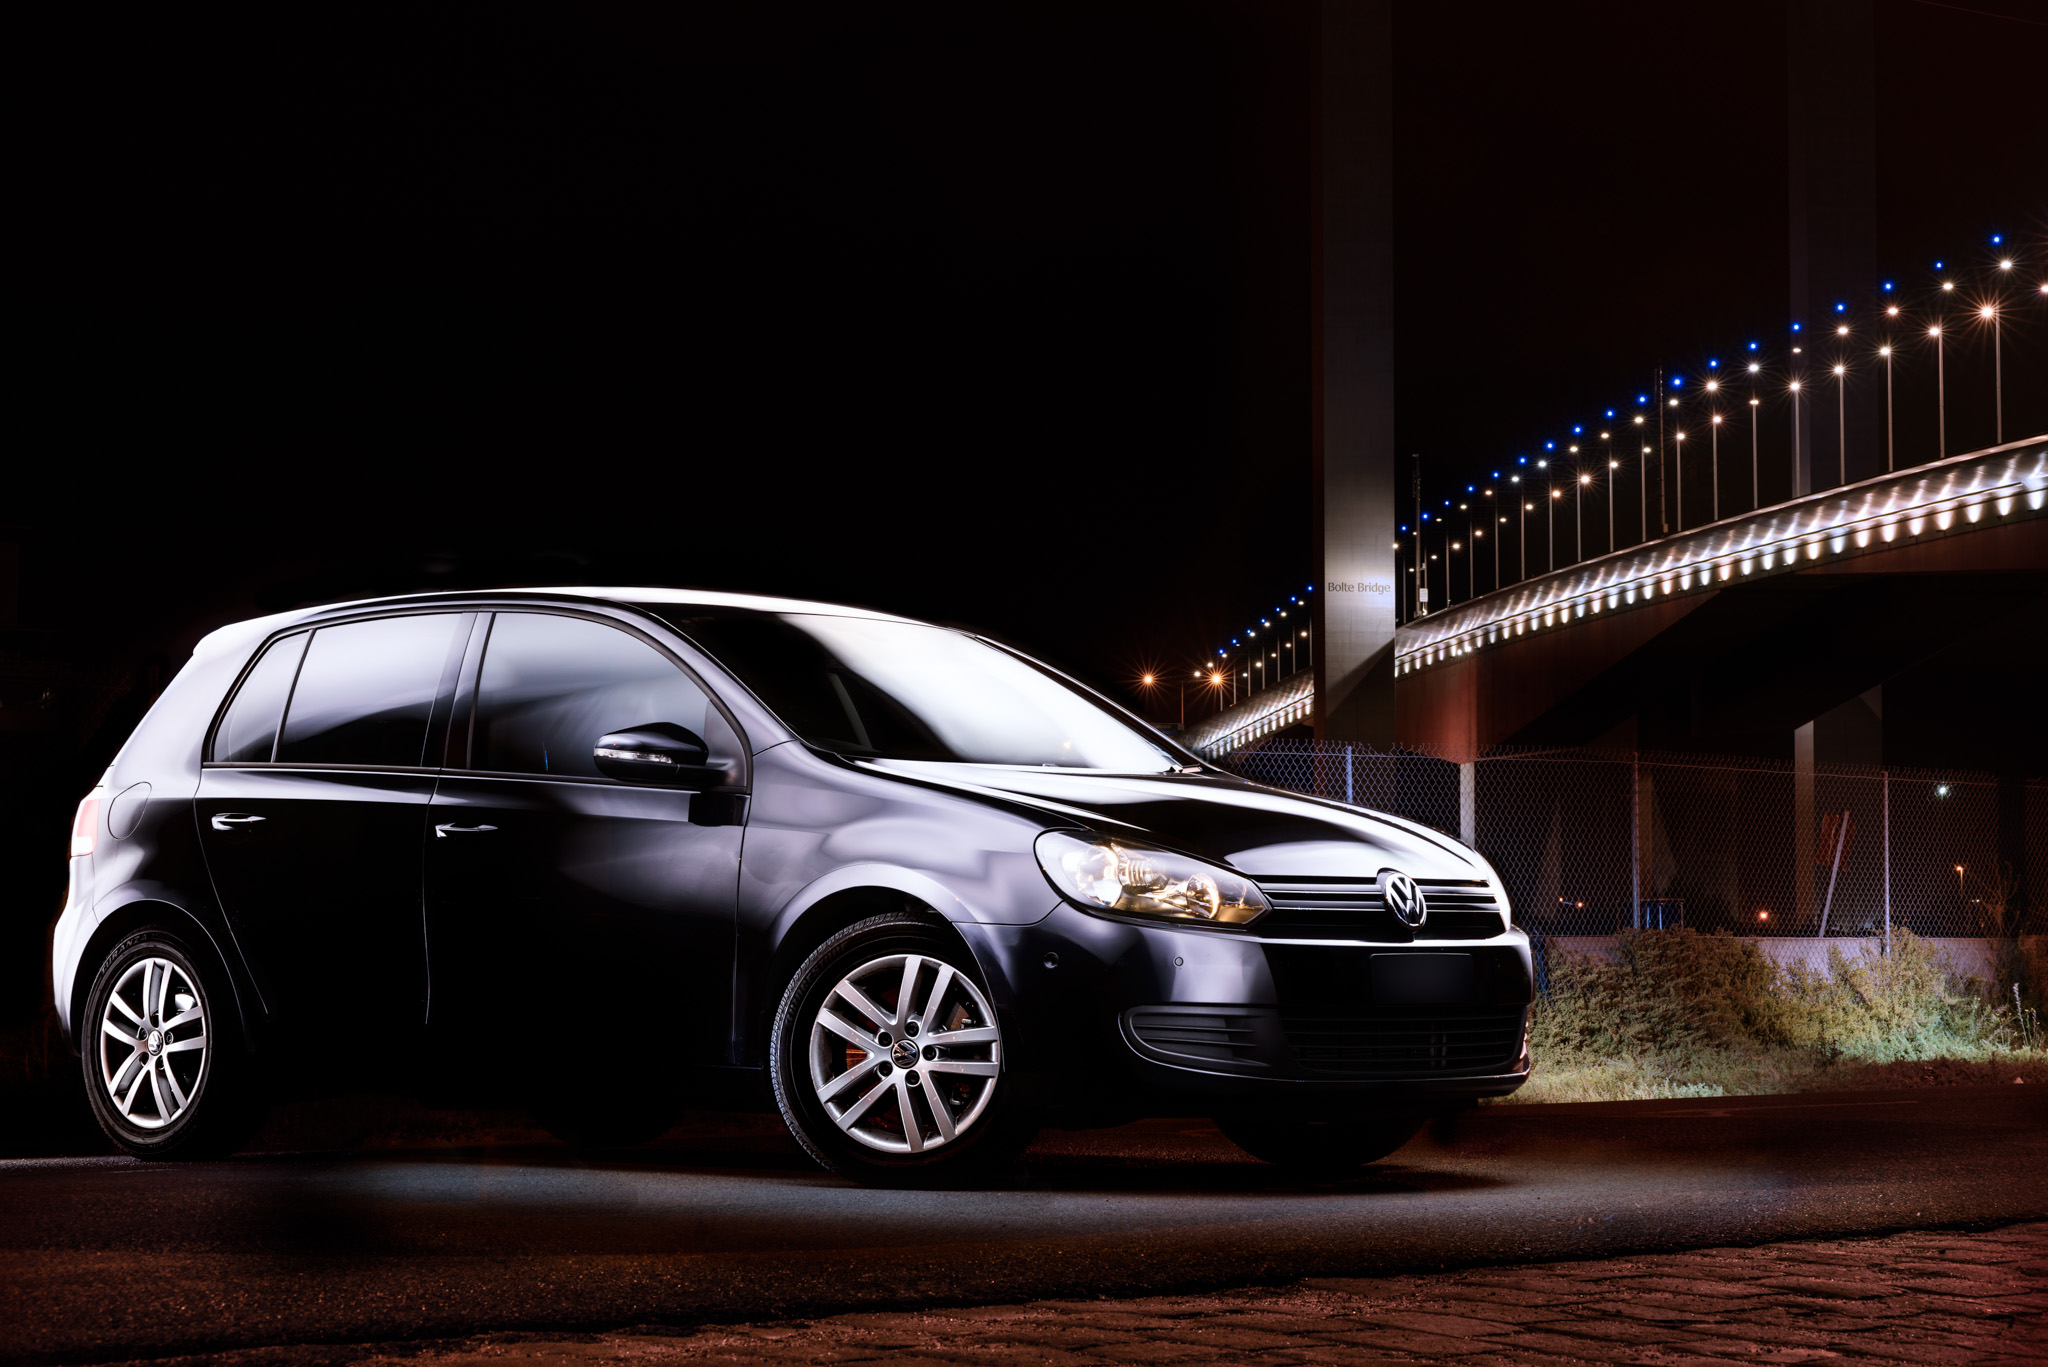 Light Painting - Light Painting - Volkswagen Golf Mk6 black Bolte Bridge